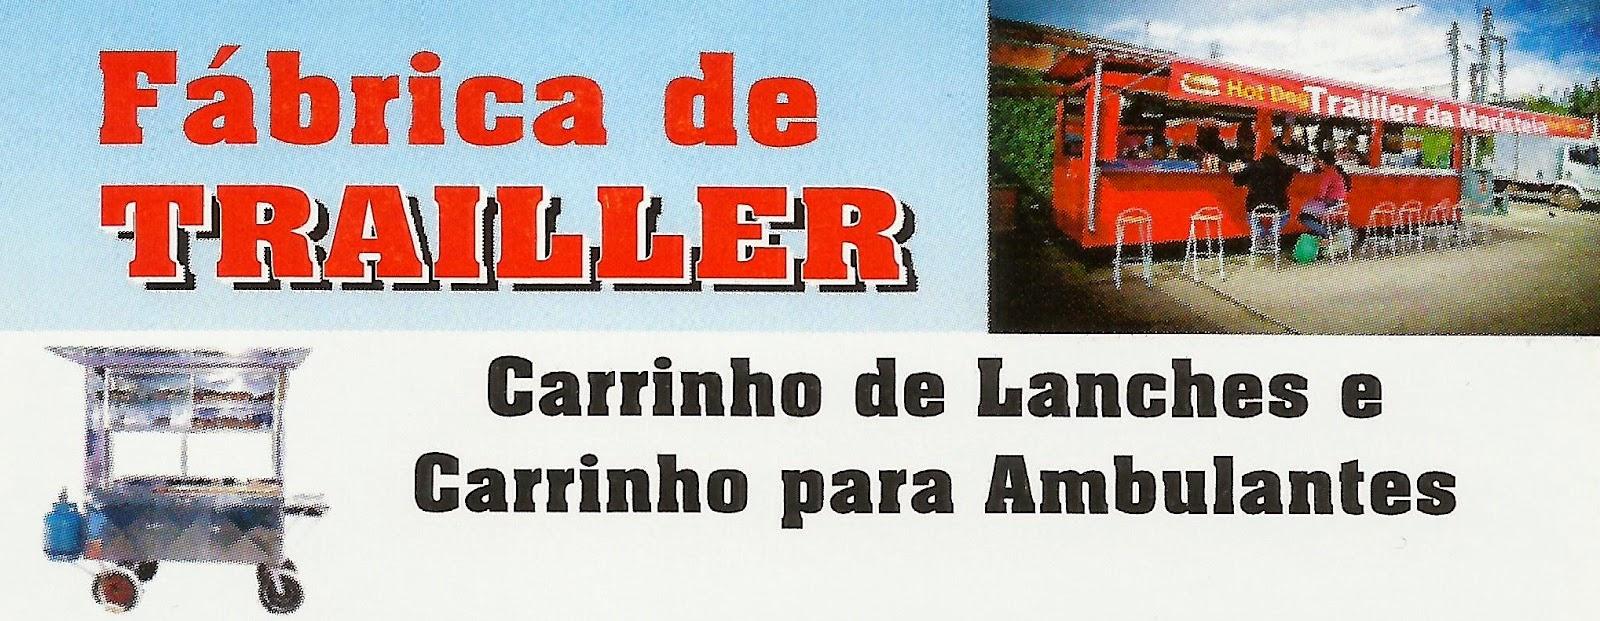 Fabrica de Trailler Rua. Nestor Trevizan, 403 Sorocaba - SP Site: www.fabricadetrailler.com.br tel: (15)3227-3918 / 3017-6064 Cel: (15) 99790-8126